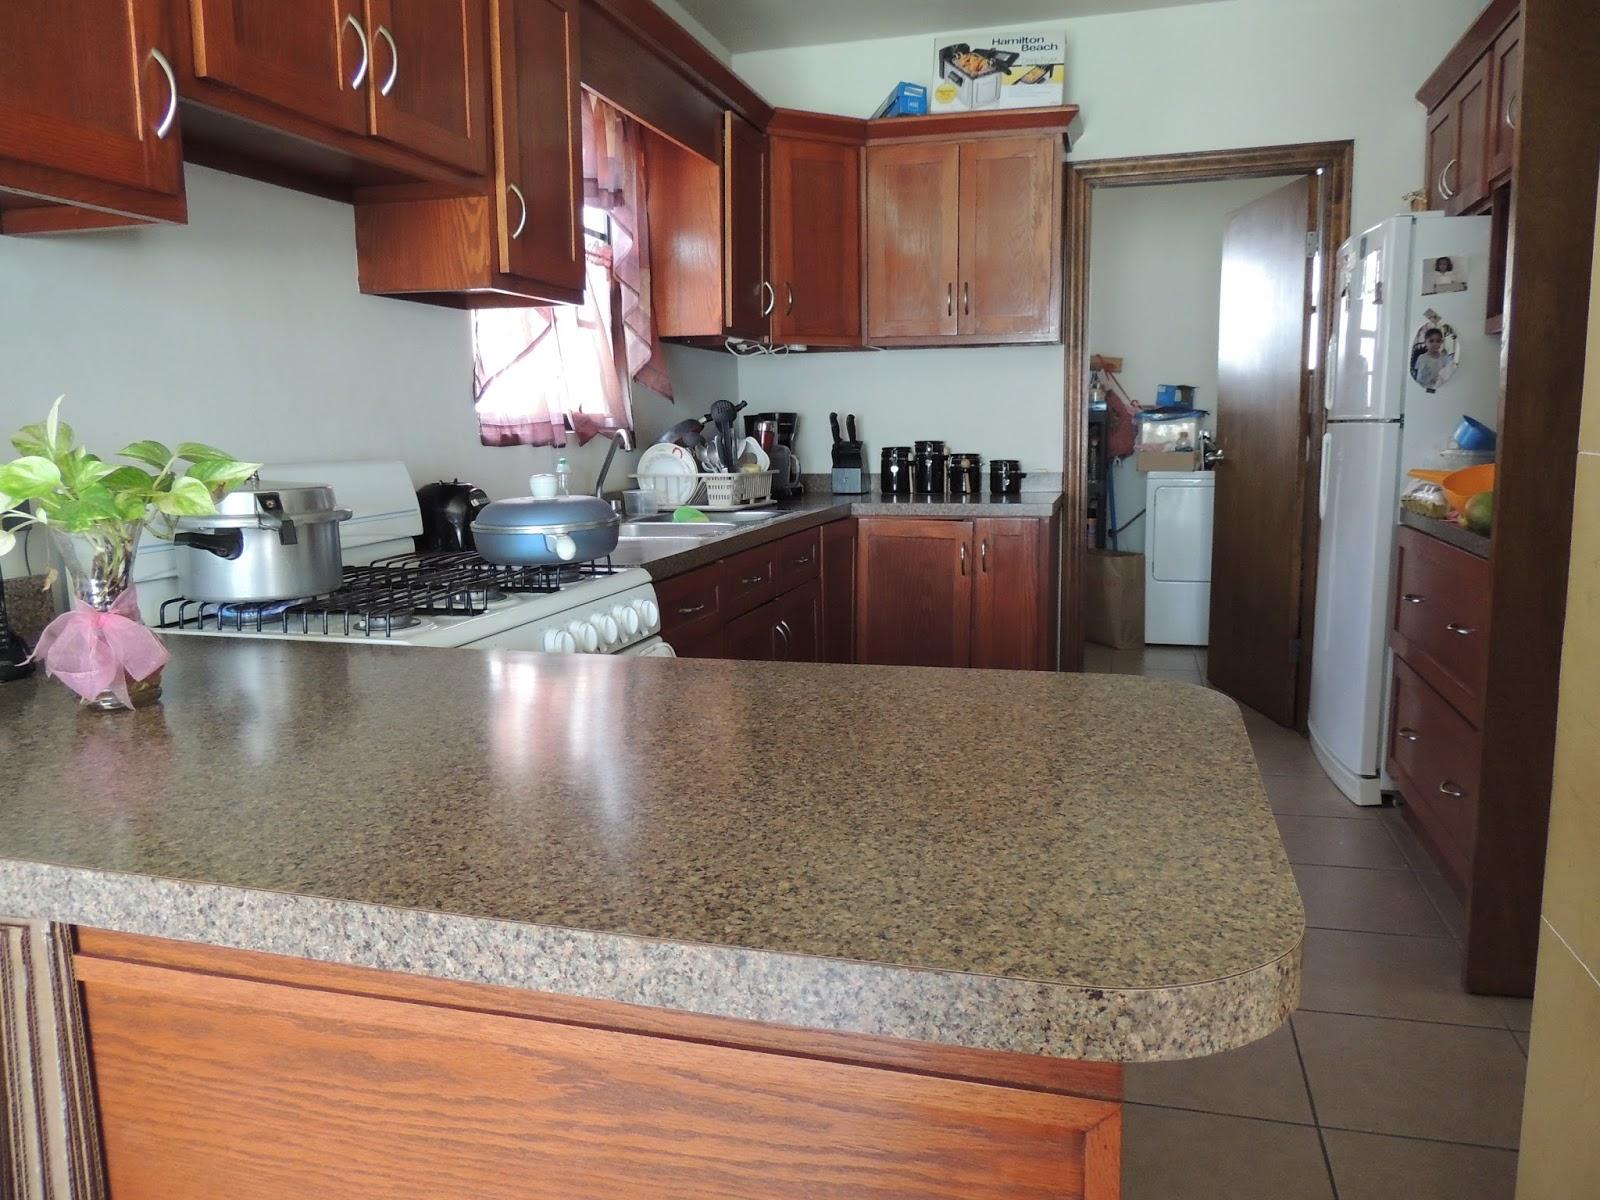 Gabinetes de cocina de base fregadero esquina myideasbedroom com